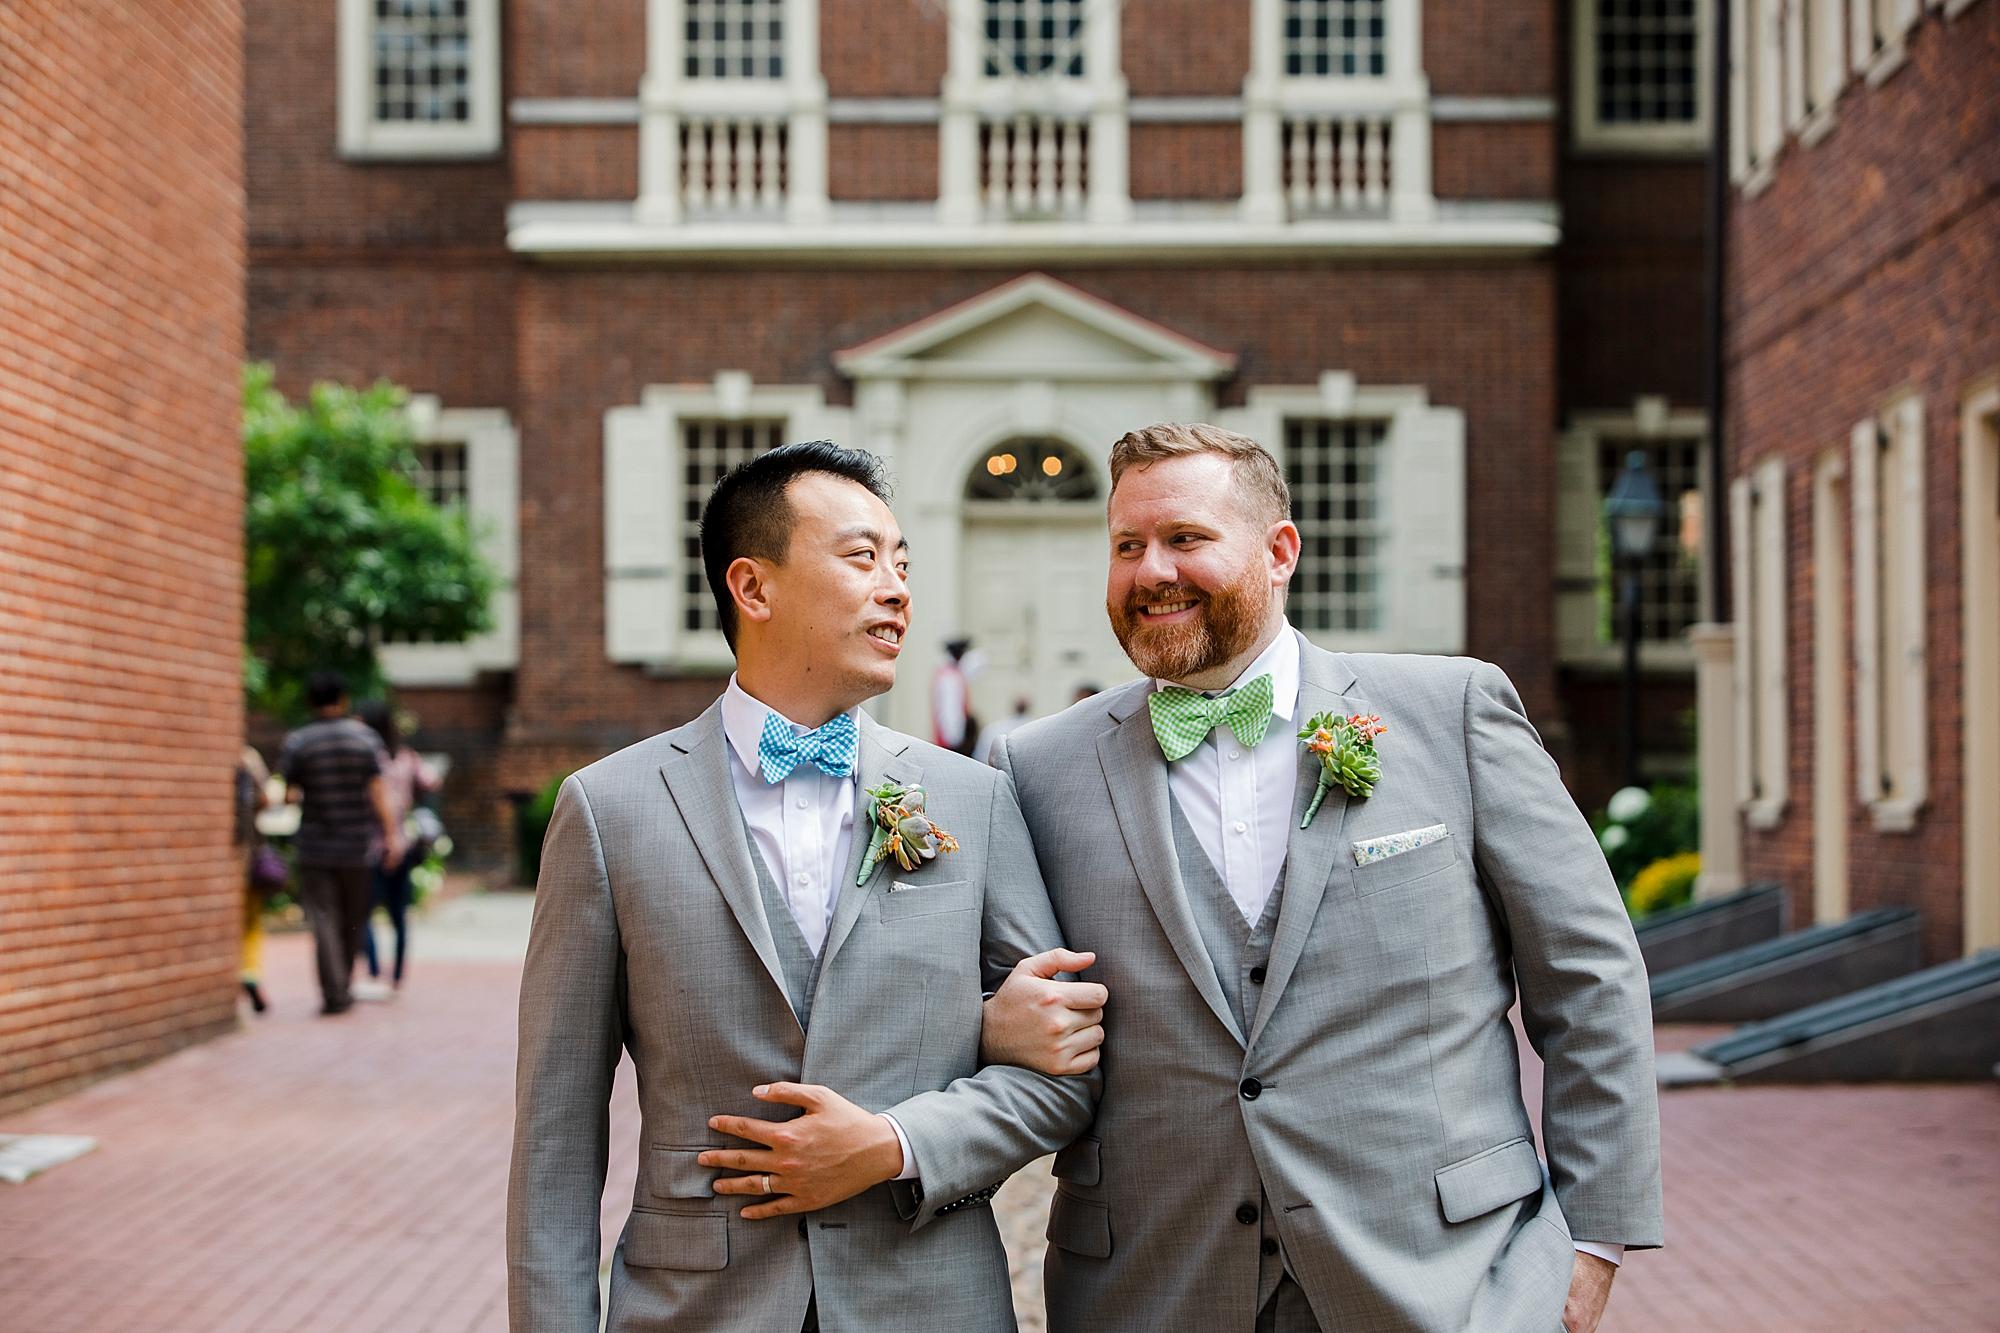 Dan_and_Byron_Love_by_Joe_Mac_Philadelphia_Wedding_LGBTQ_Photography_Gay_Independence_visitor_Center_48.JPG